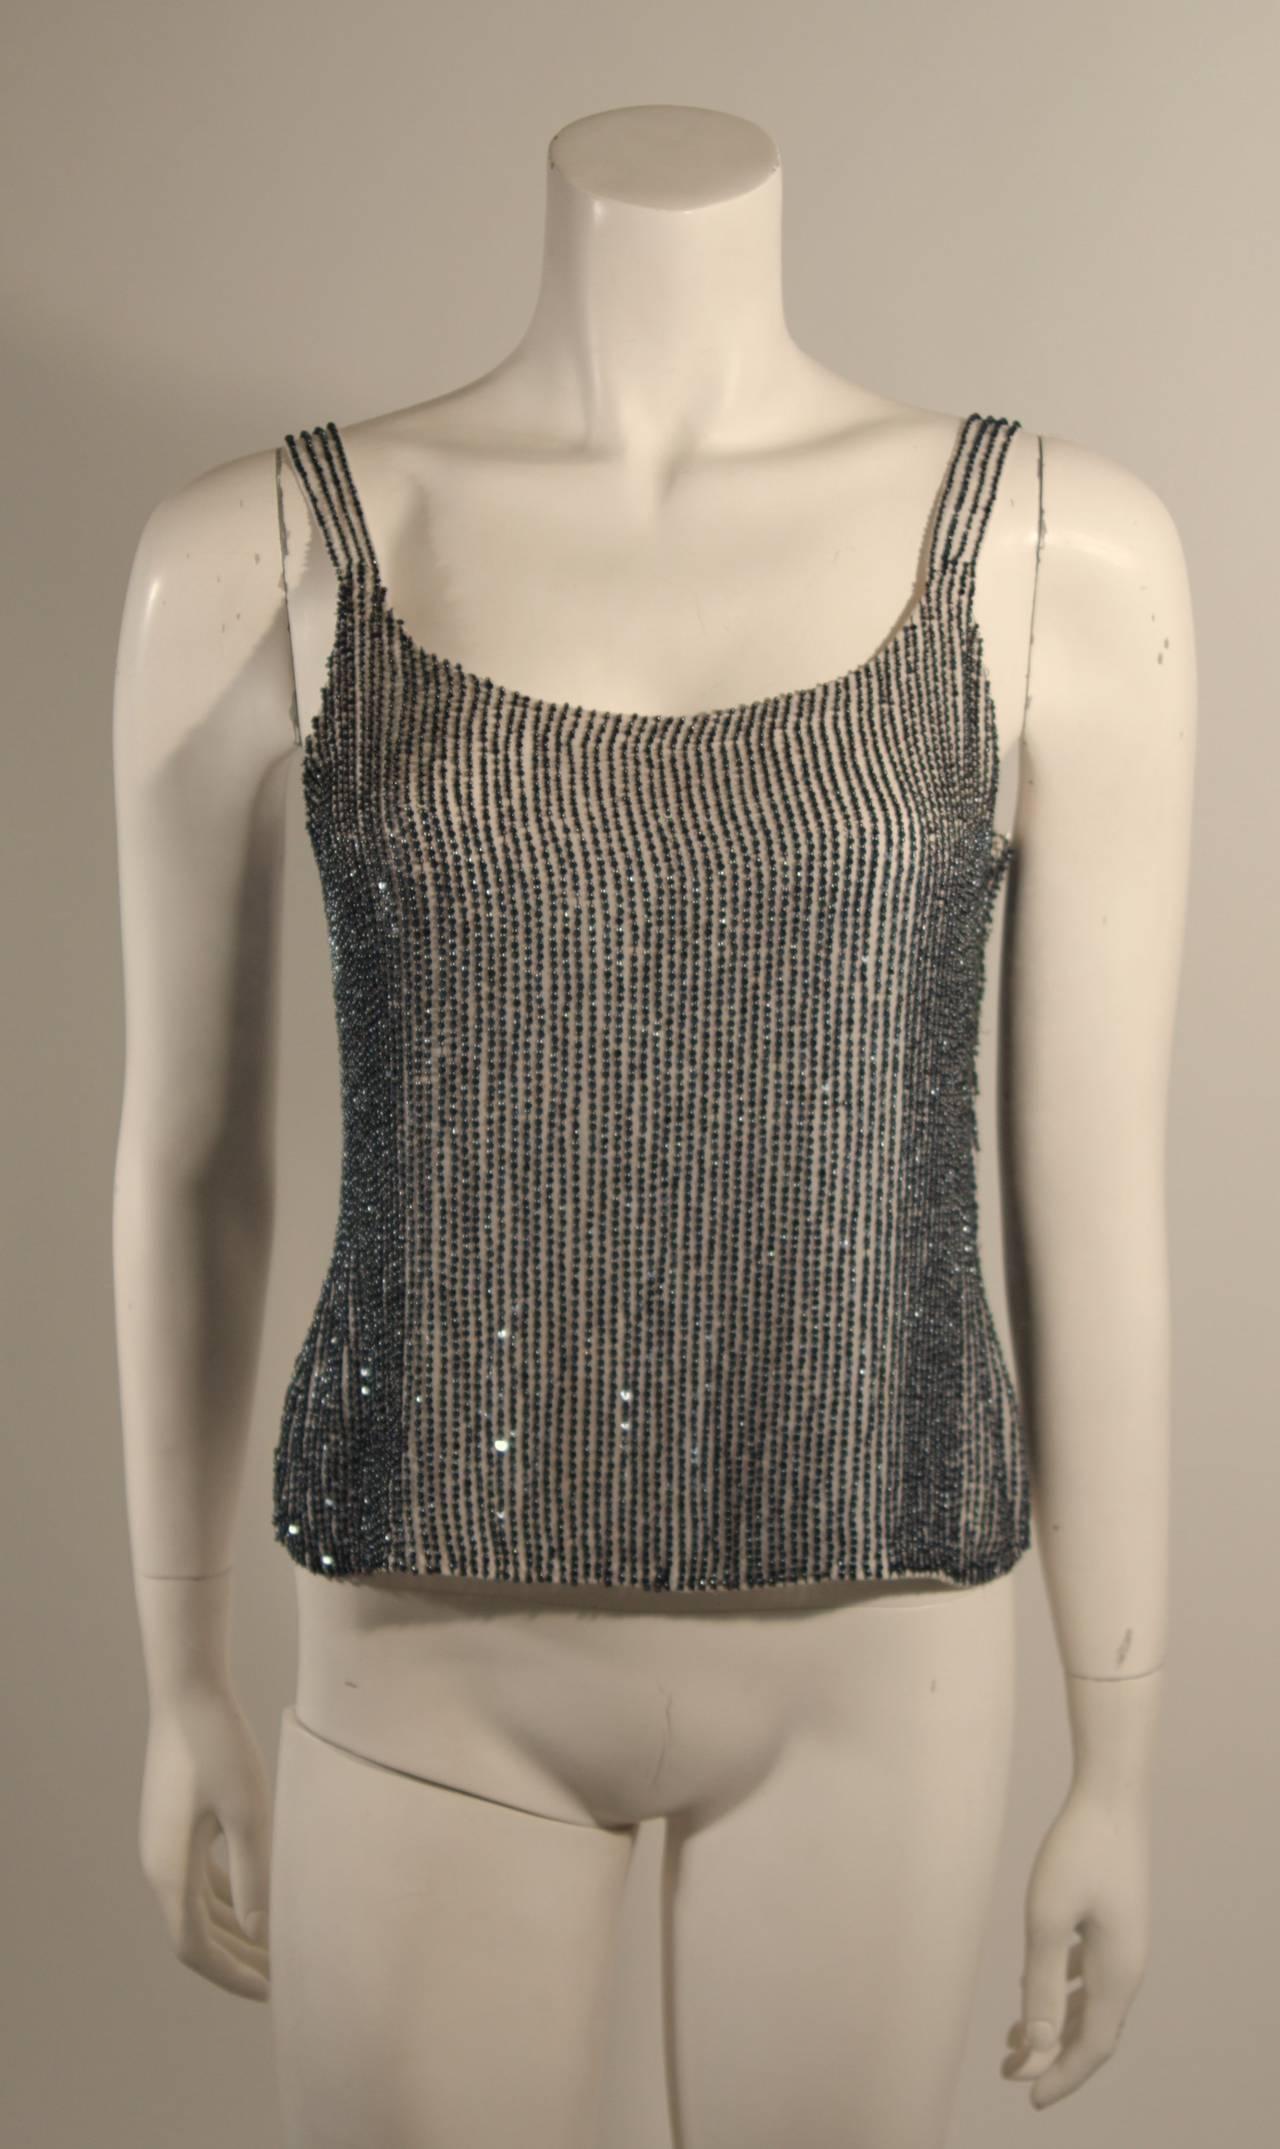 Oscar De La Renta Evening Blouse and Camisole Size 8 For Sale 4